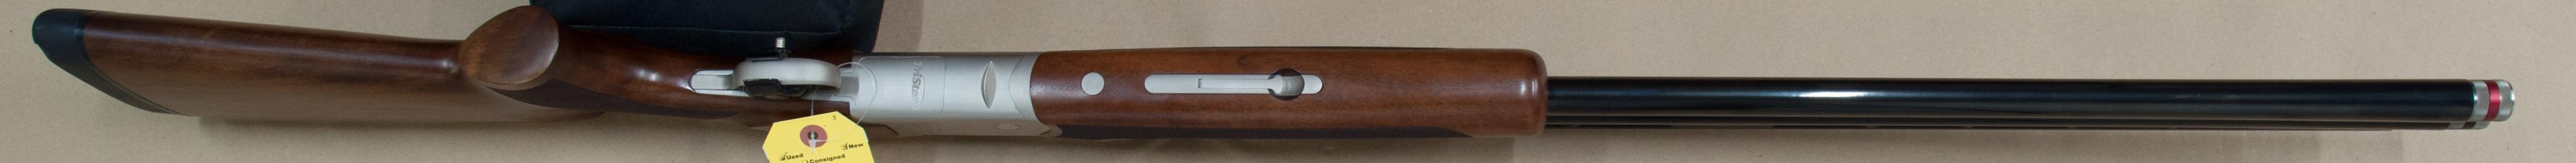 dbm hardwood flooring of firearms gobles firearms regarding pic4